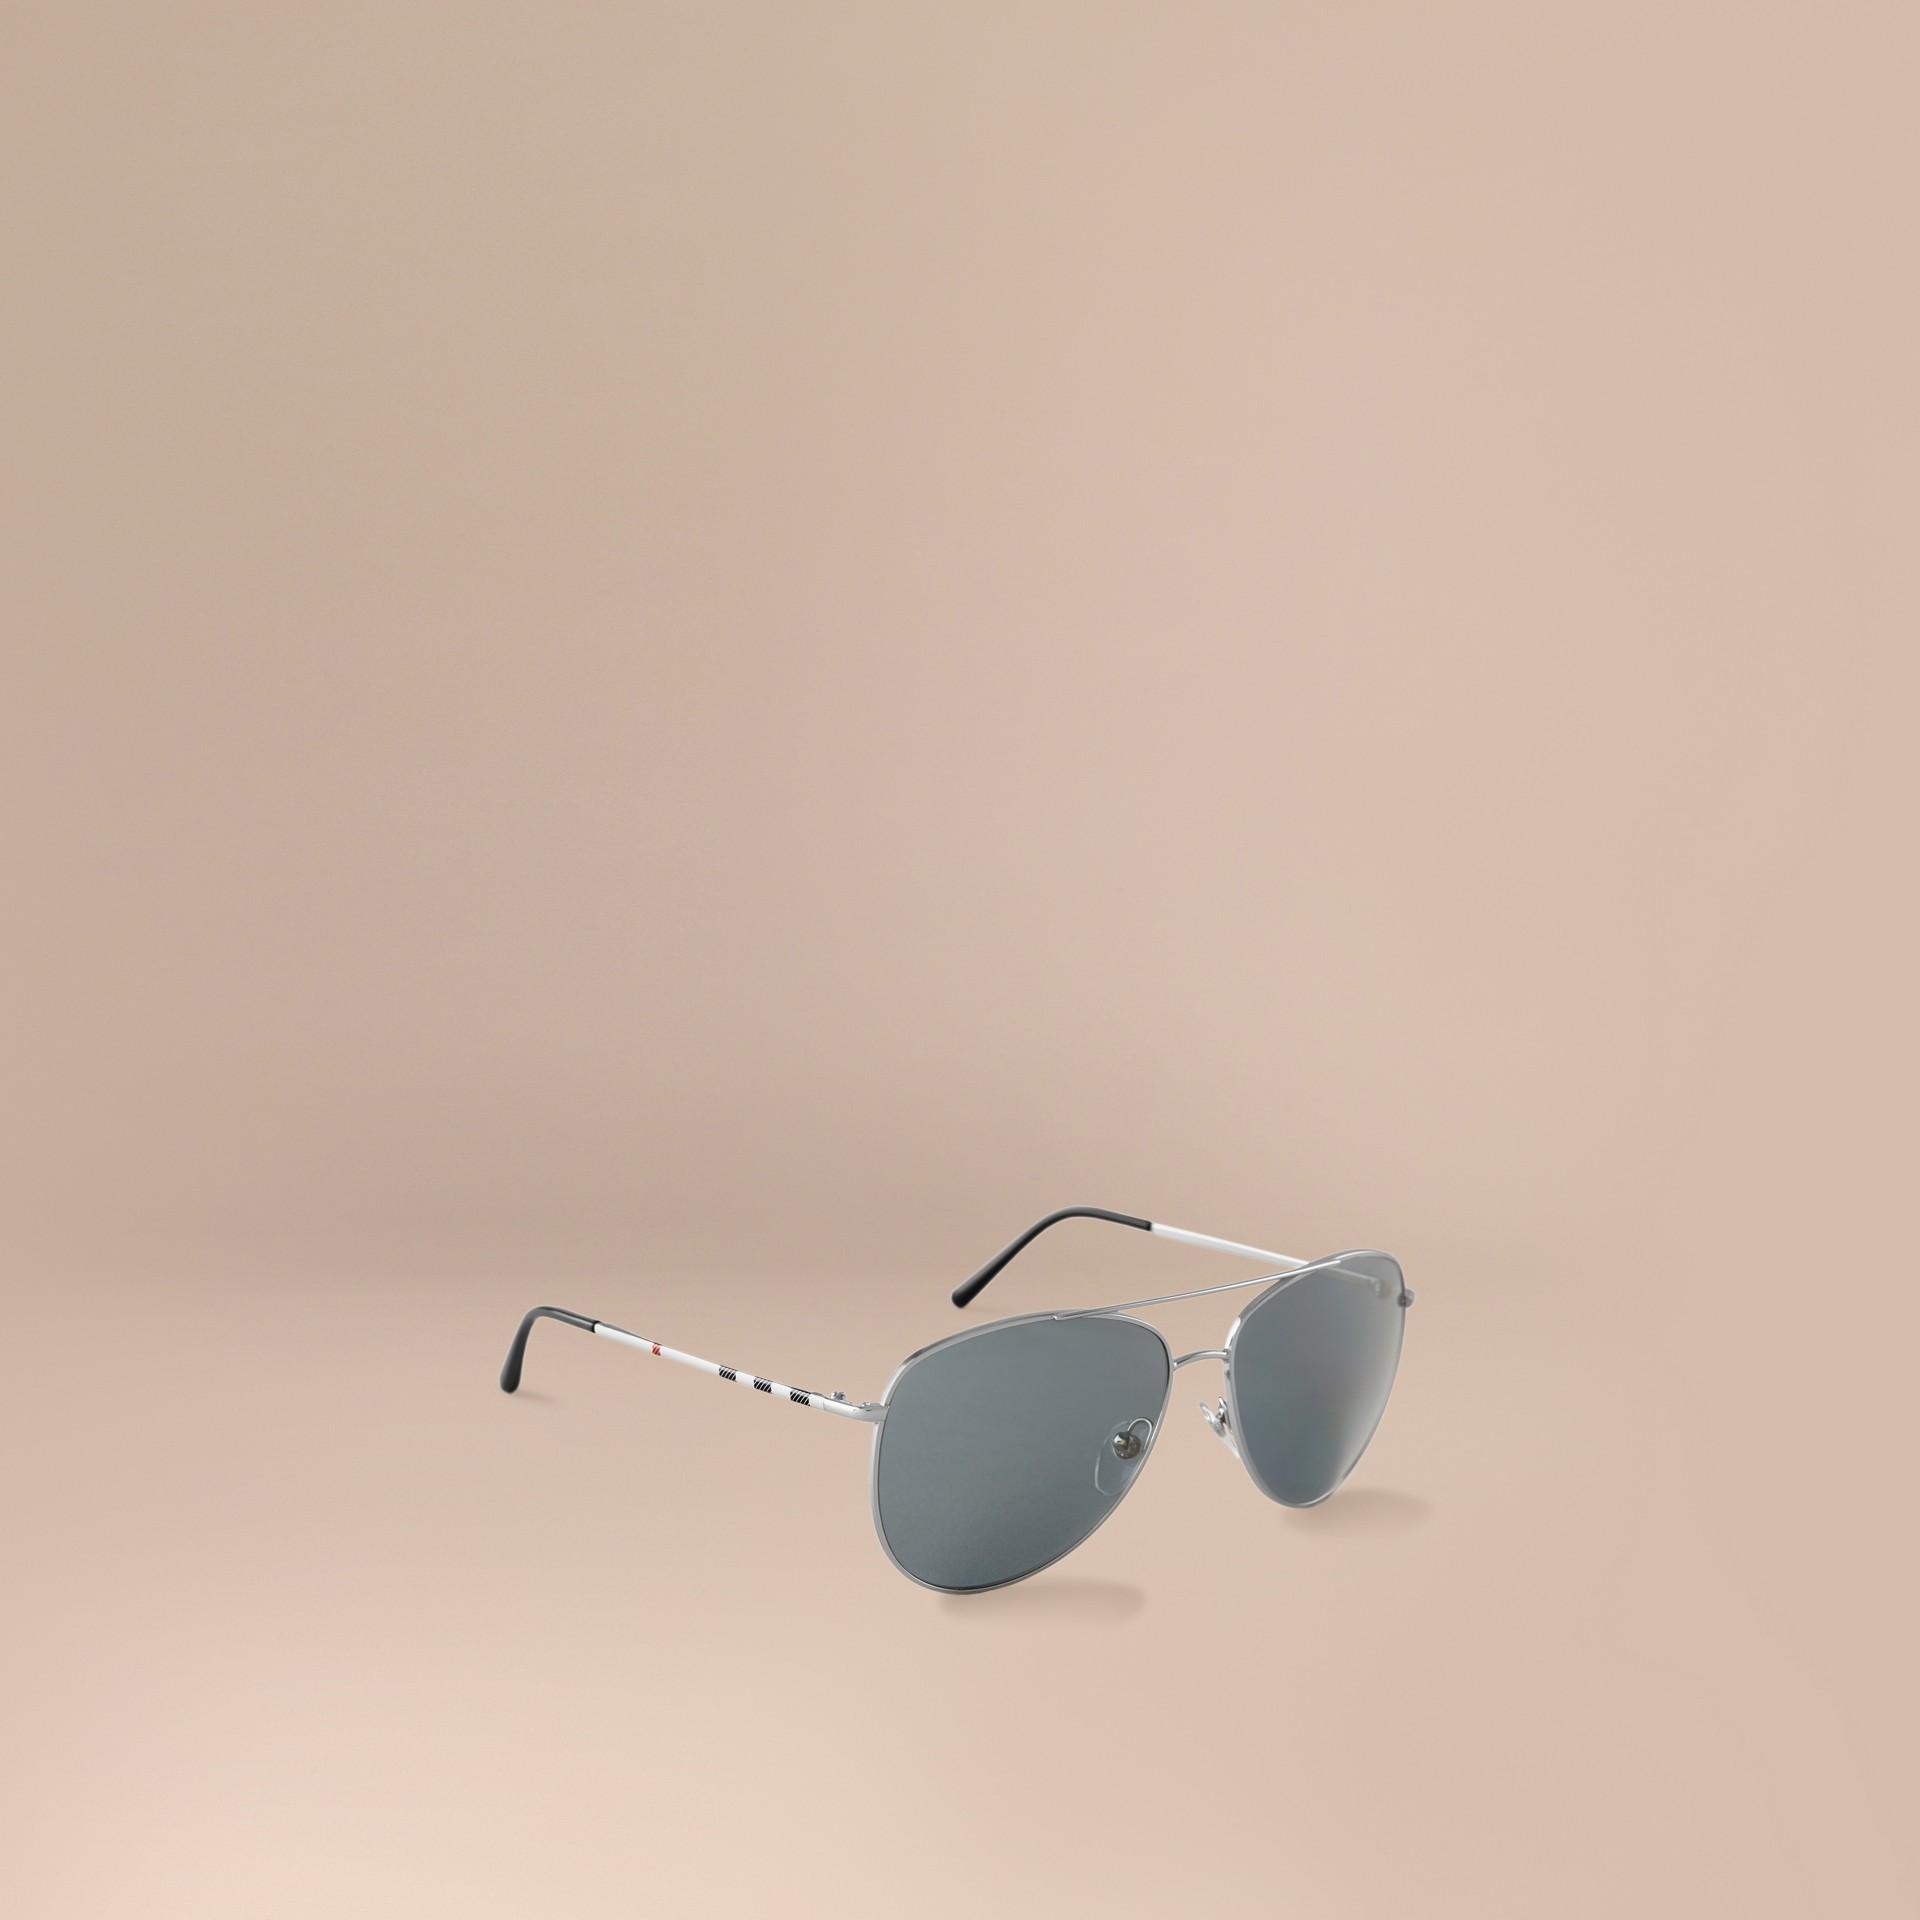 Silver Check Arm Aviator Sunglasses Silver - gallery image 1